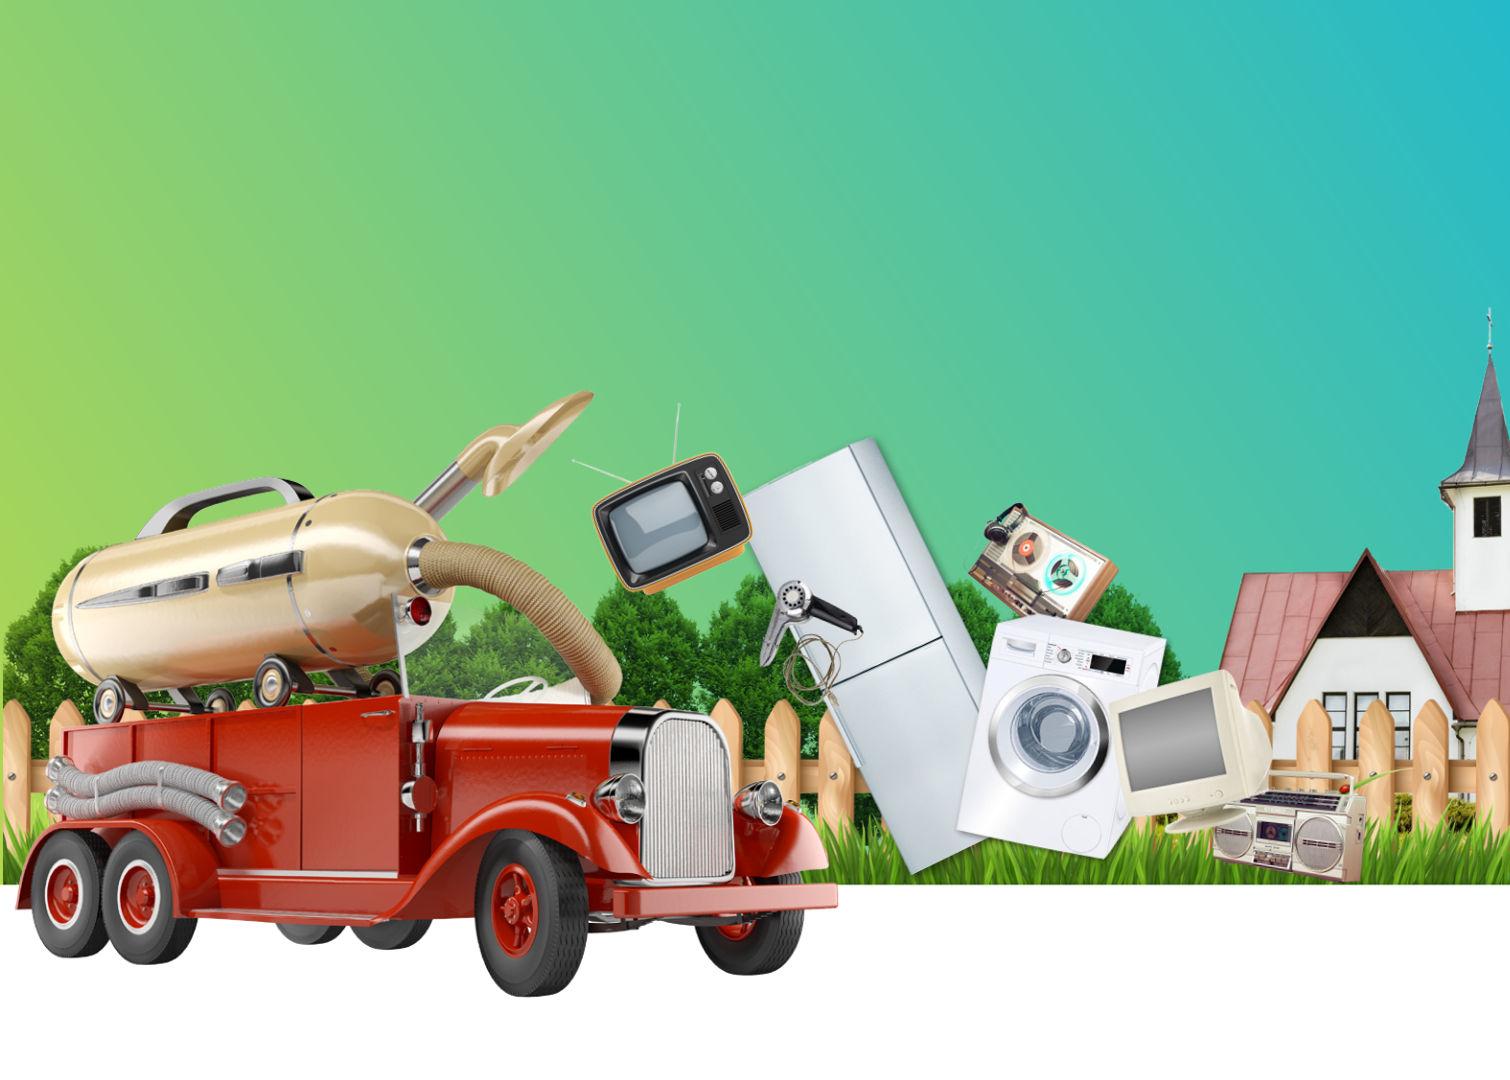 http://www.recyklujteshasici.cz/themes/rsh2/images/hp.jpg